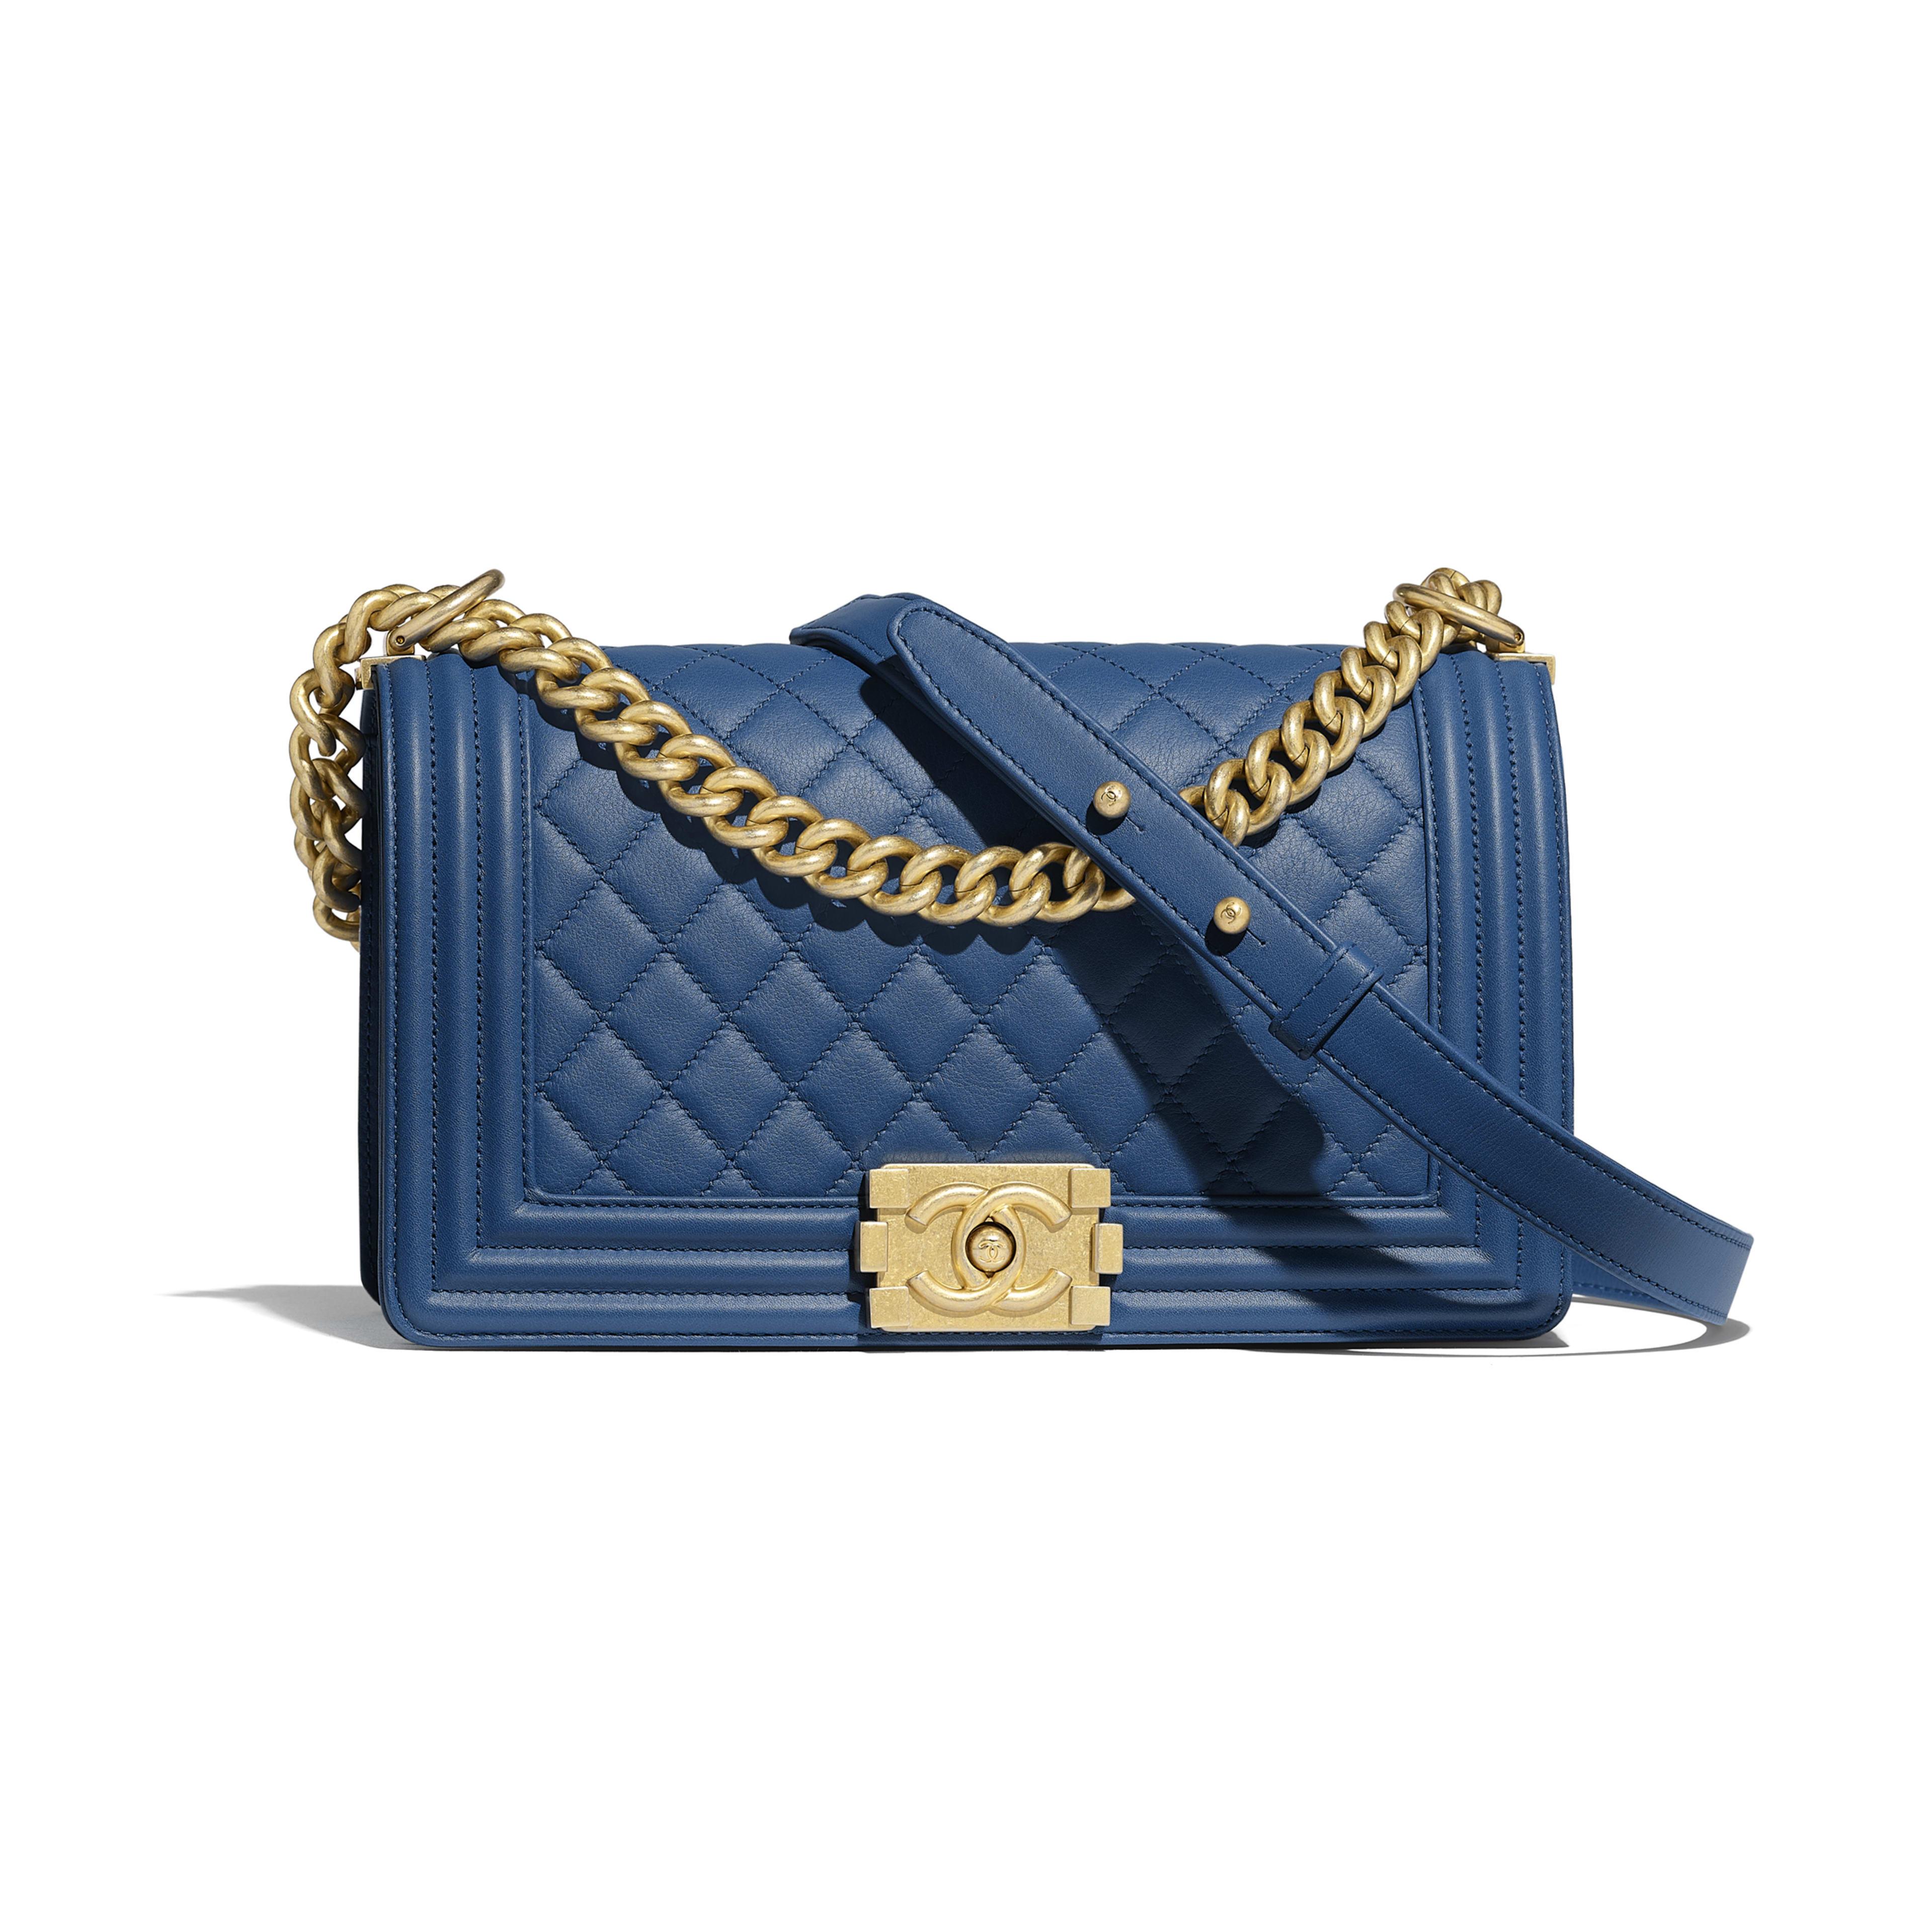 BOY CHANEL Handbag - Dark Blue - Calfskin & Gold-Tone Metal - Default view - see full sized version